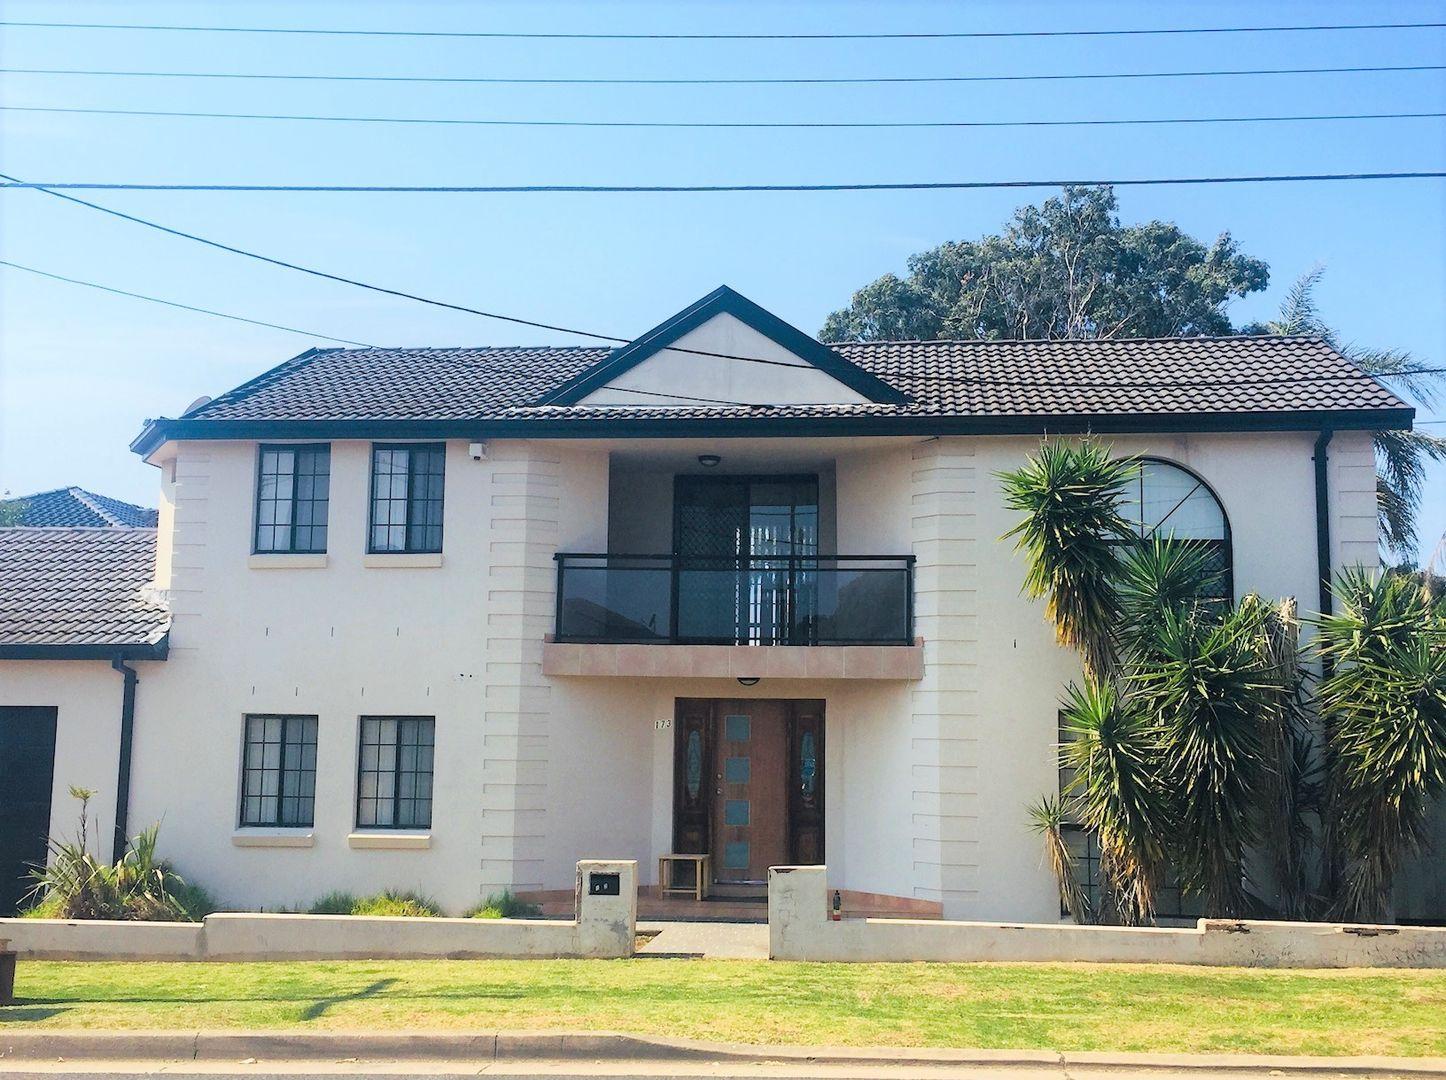 173 Acacia Ave, Greenacre NSW 2190, Image 0